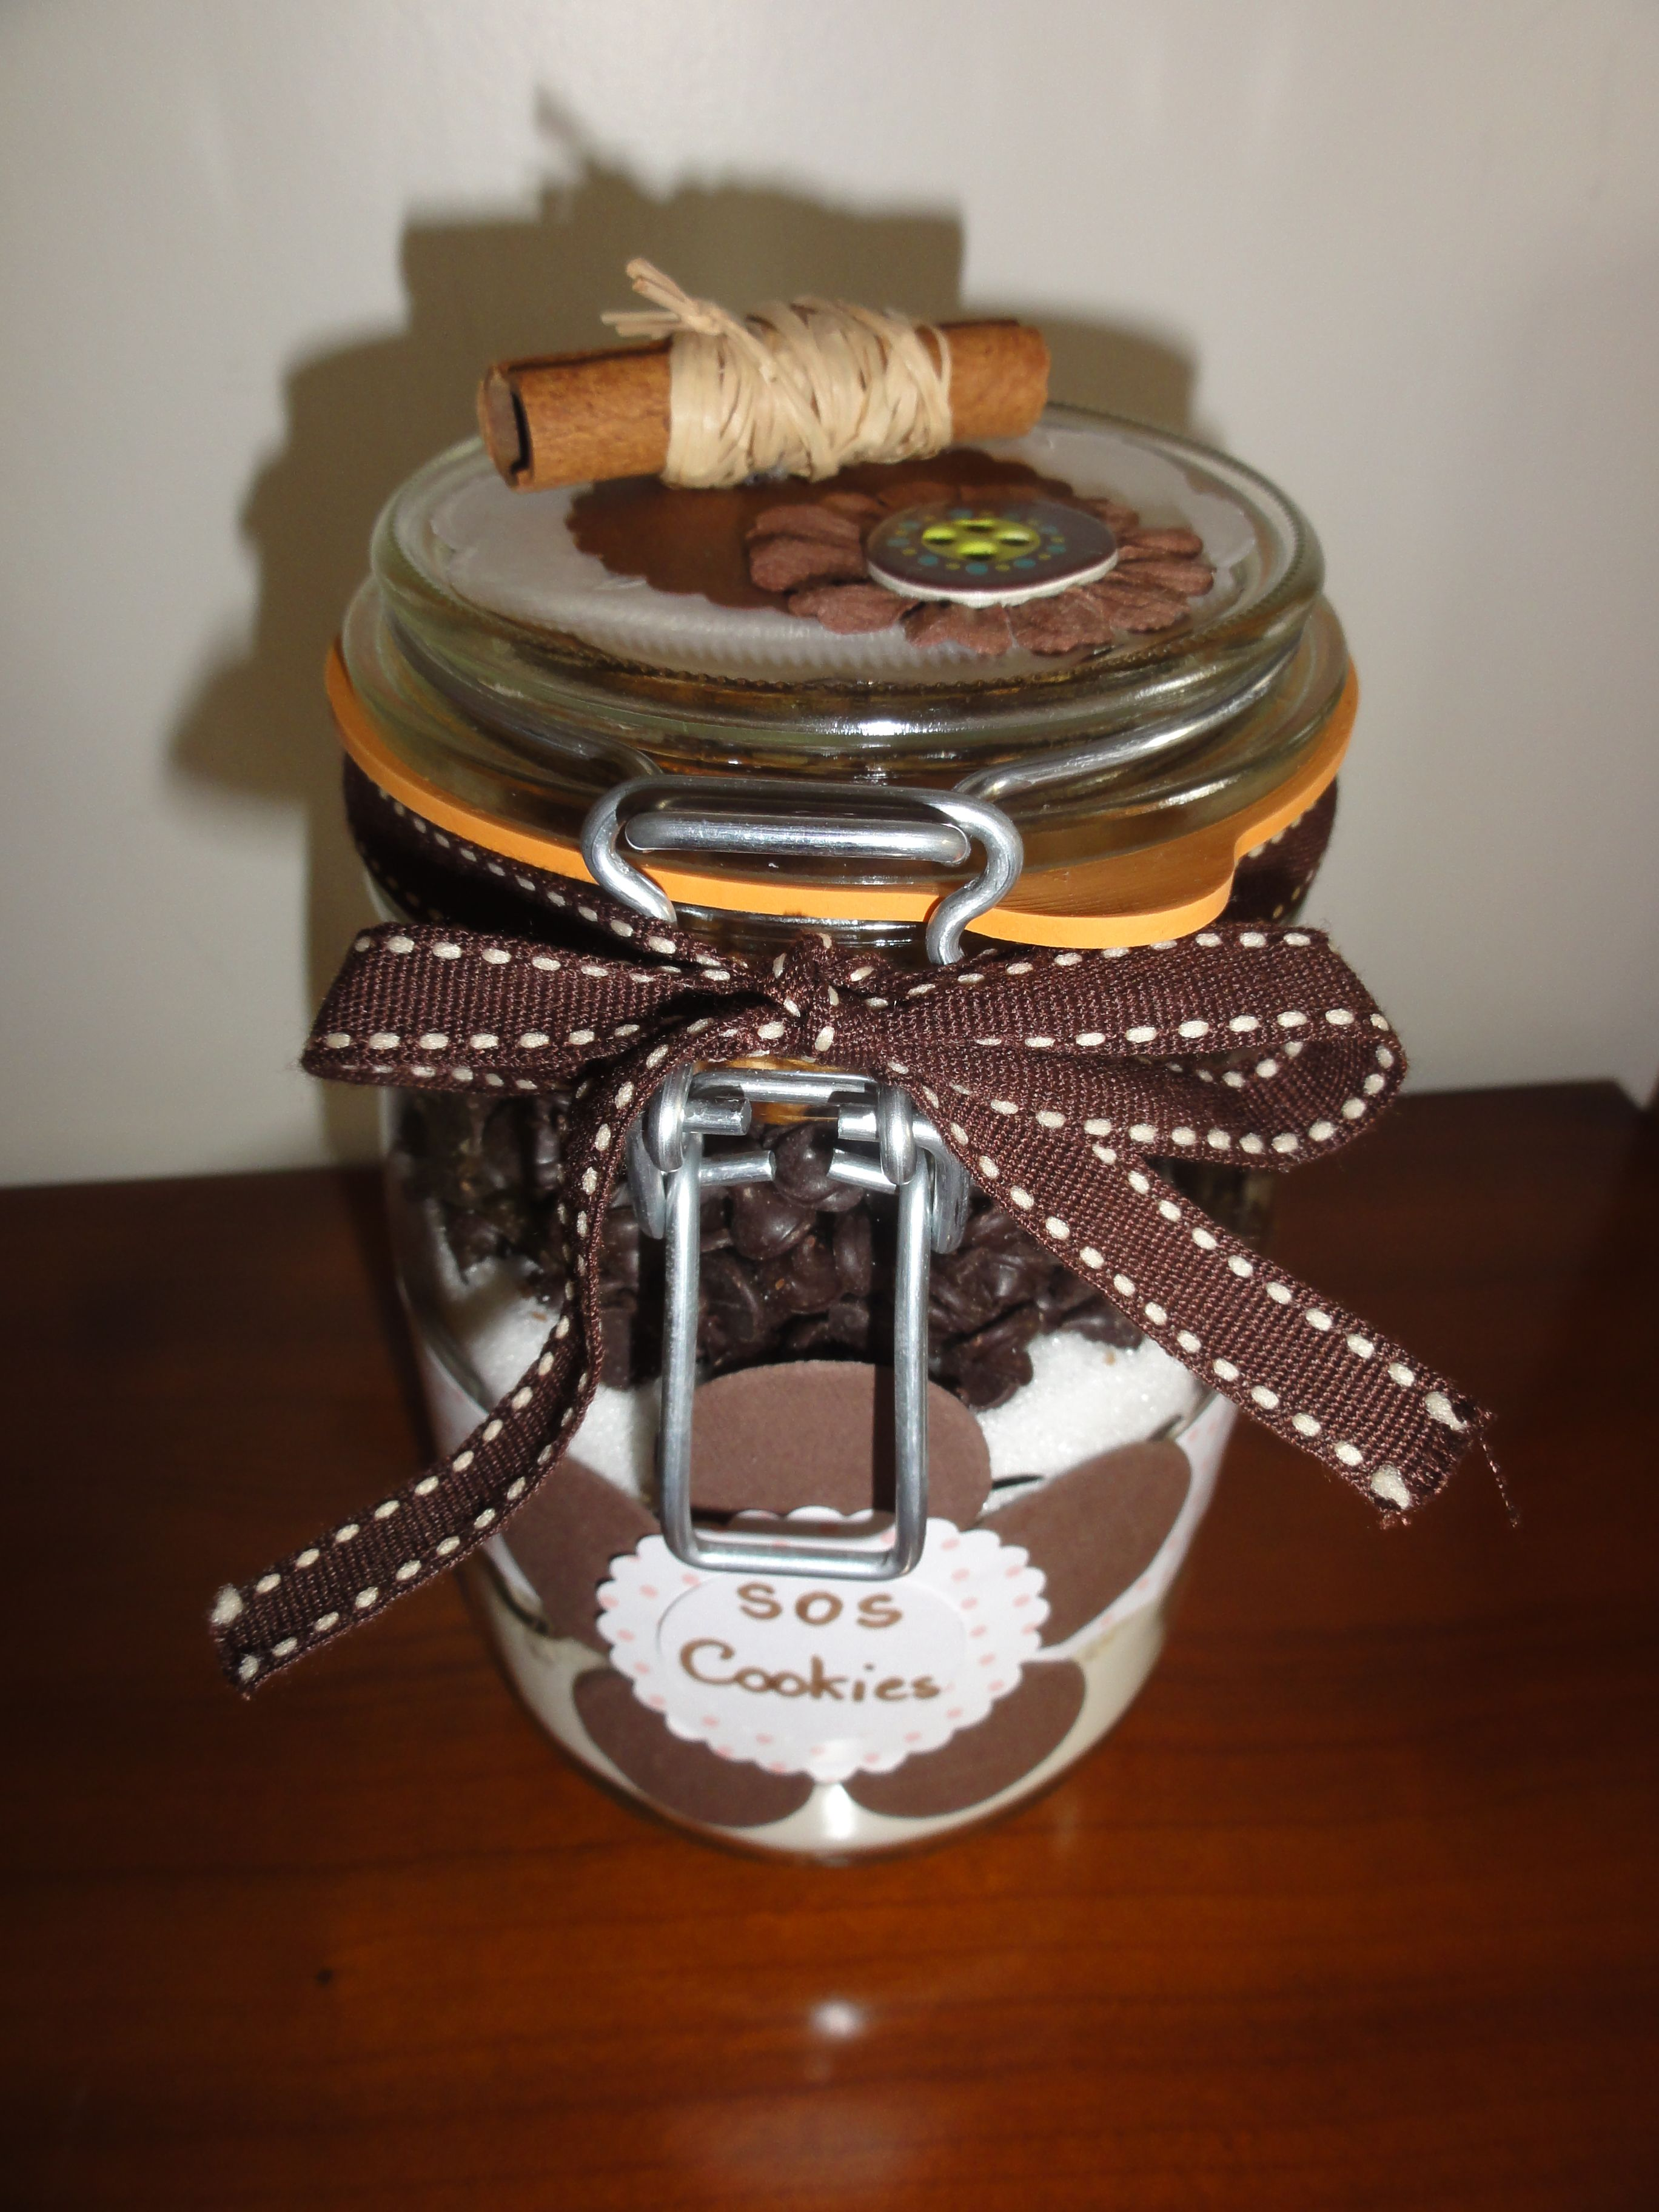 kit sos cookies cadeau gourmand kits gourmands offrir pinterest sos cookies gourmands. Black Bedroom Furniture Sets. Home Design Ideas